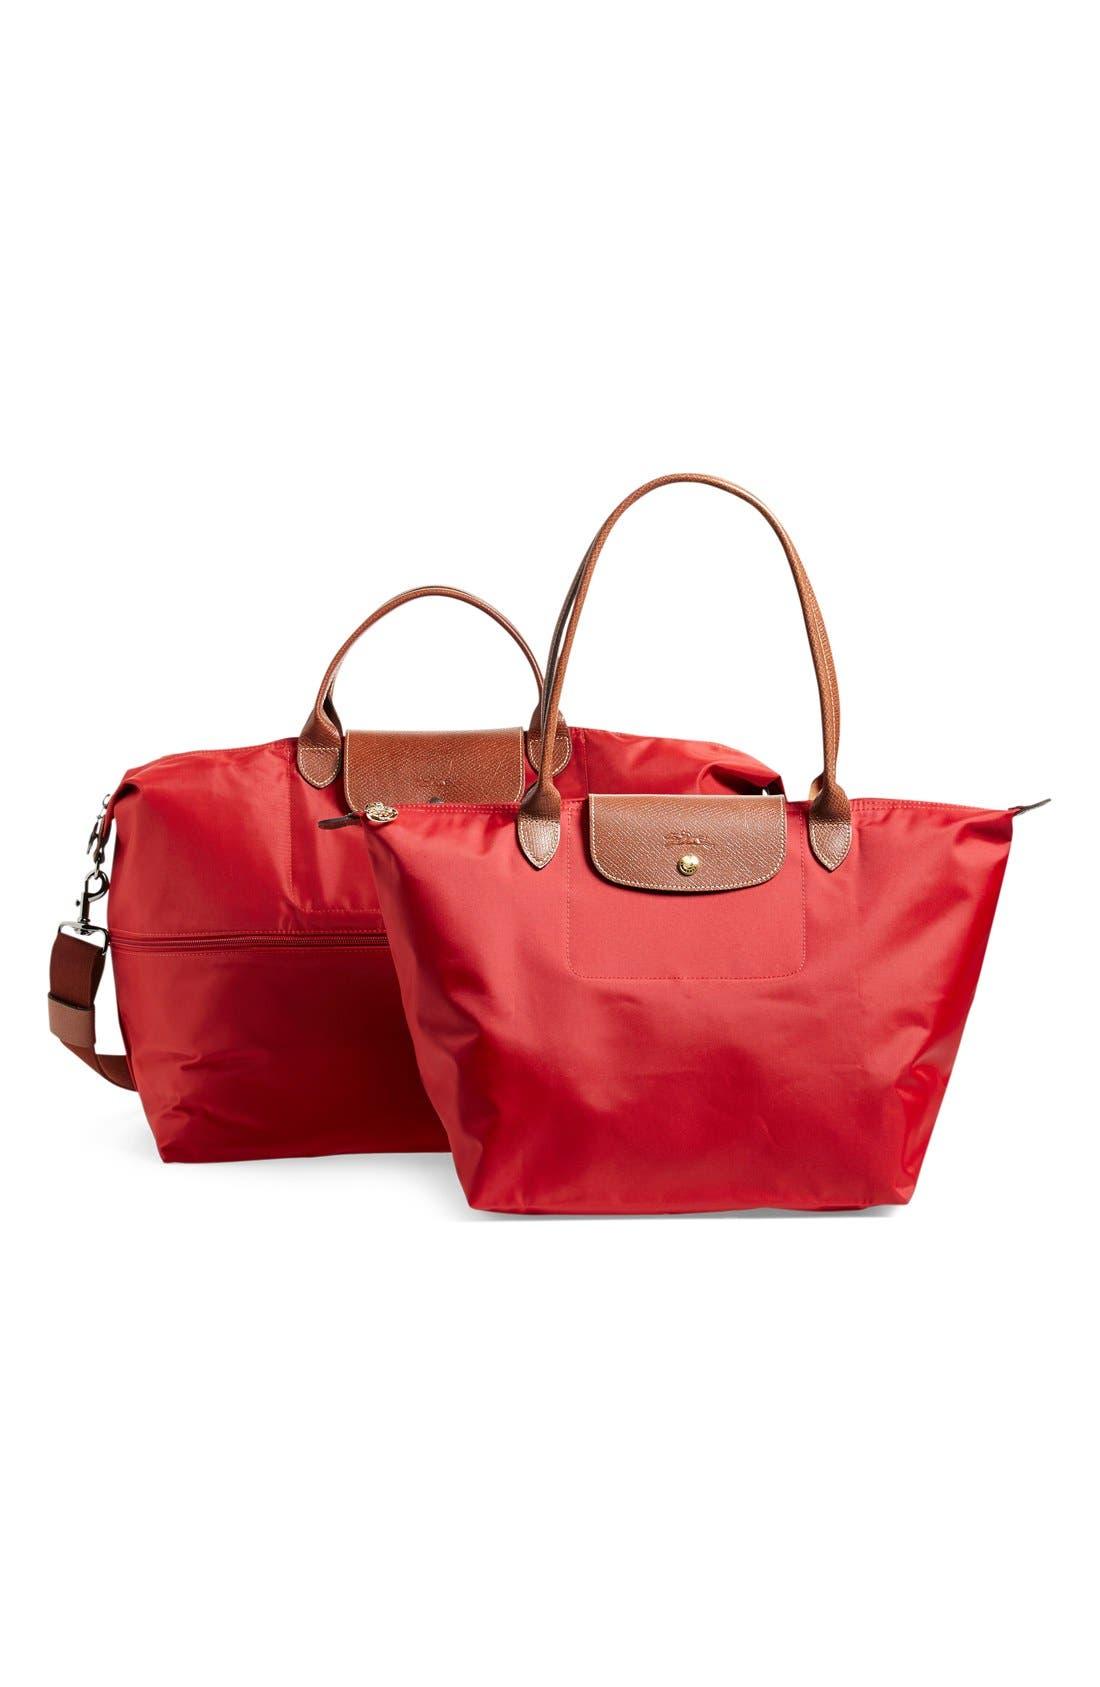 Longchamp Tote & Travel Bag